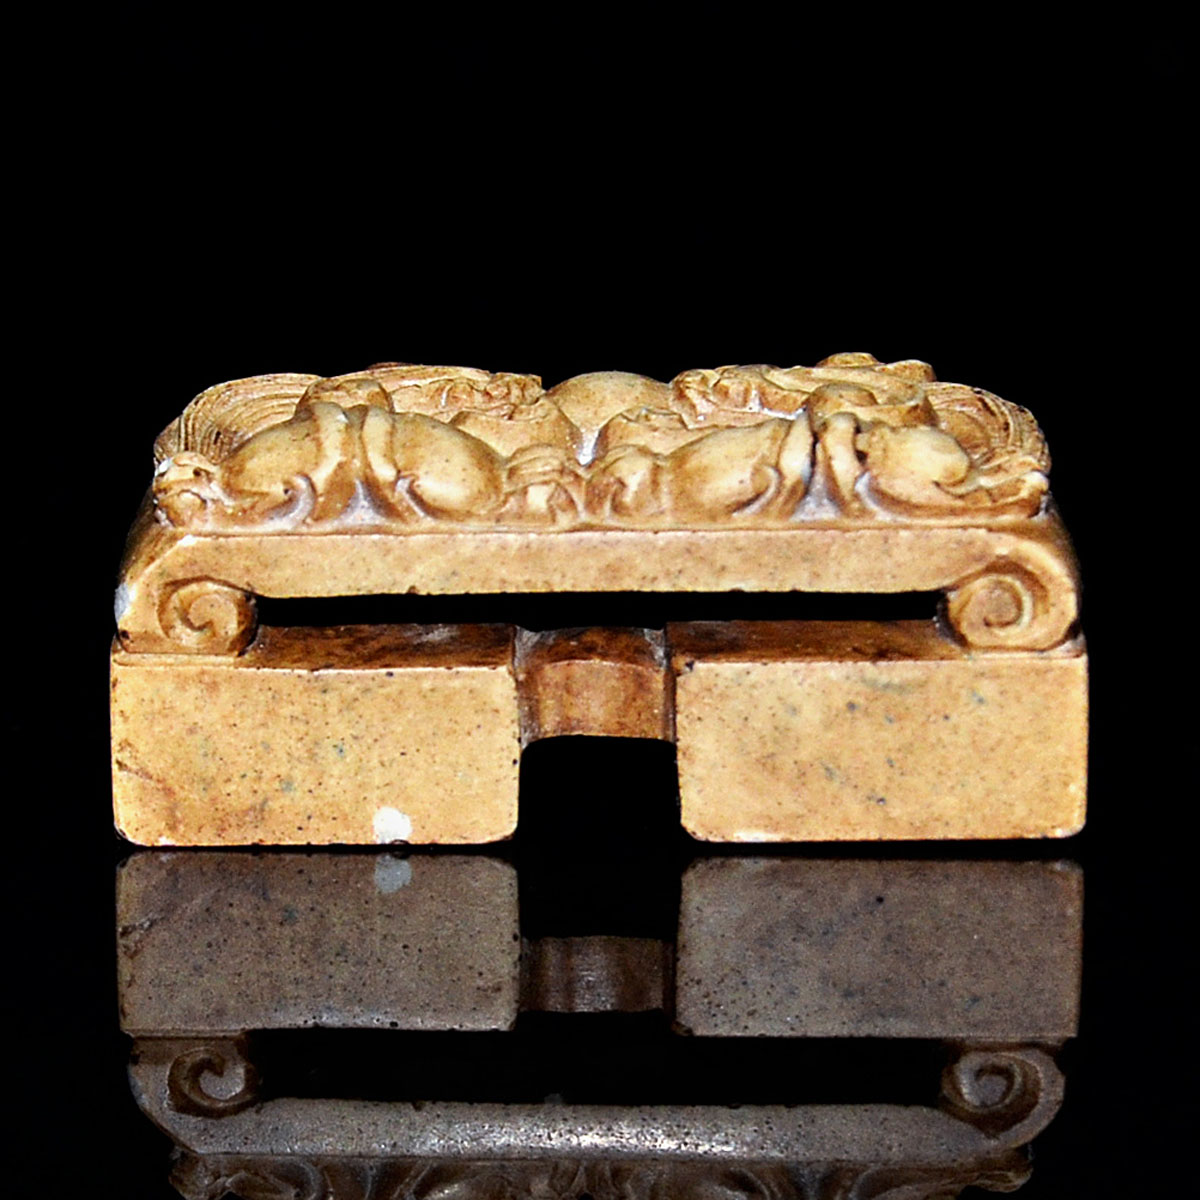 古玉雕二龍爭珠劍鞘雙連印章 印文(惠風和暢)(清淨學海) Archaistic Jade Scabbard Seal With relief carved dragons chasing